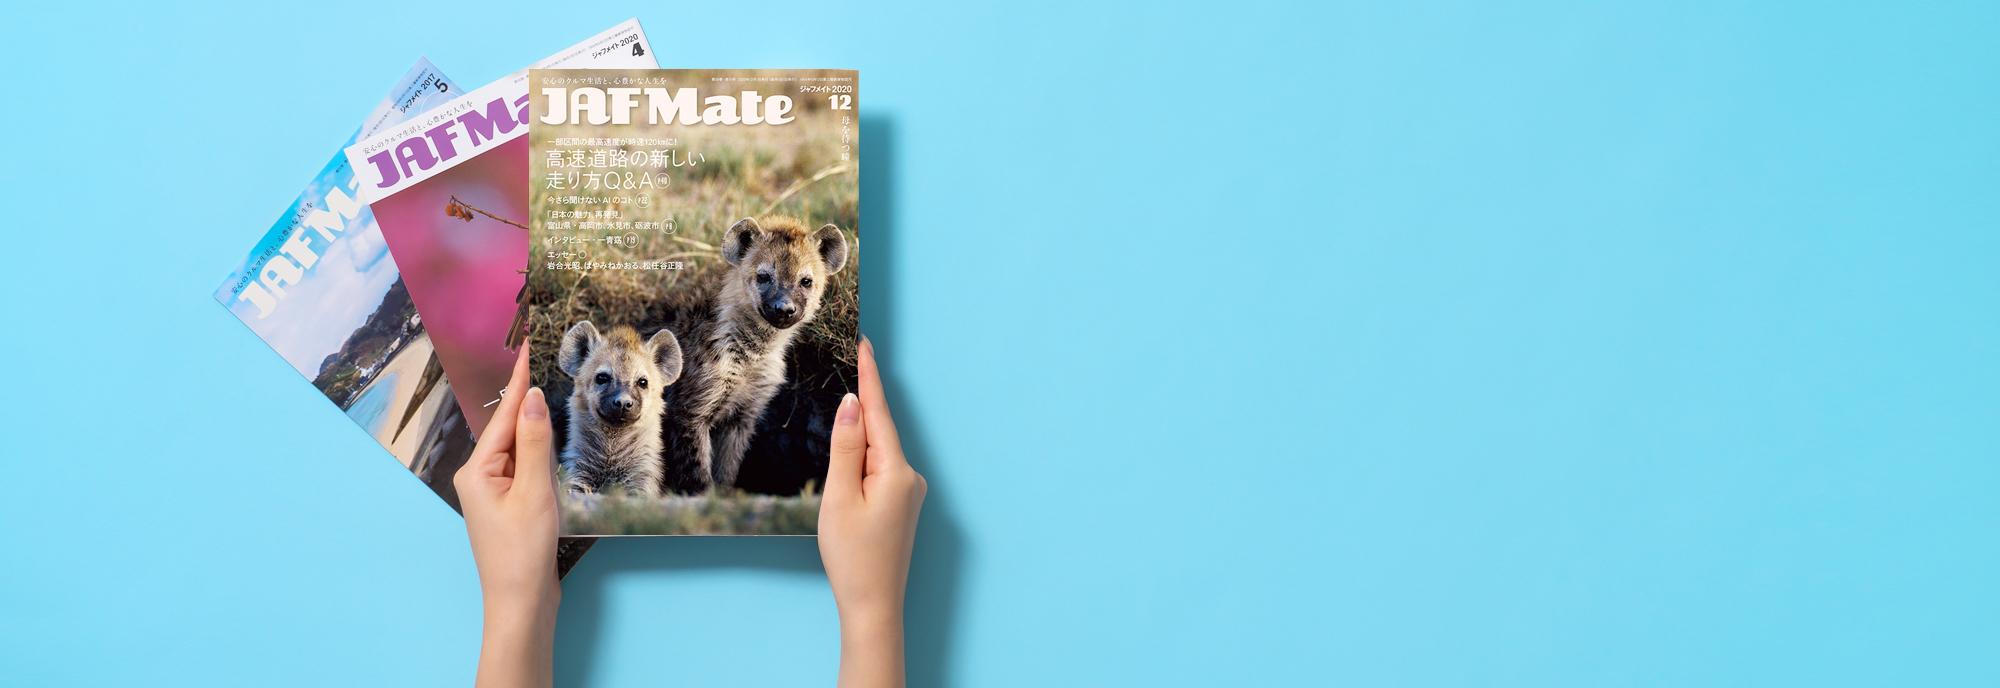 JAF Mate誌 2020年12月号